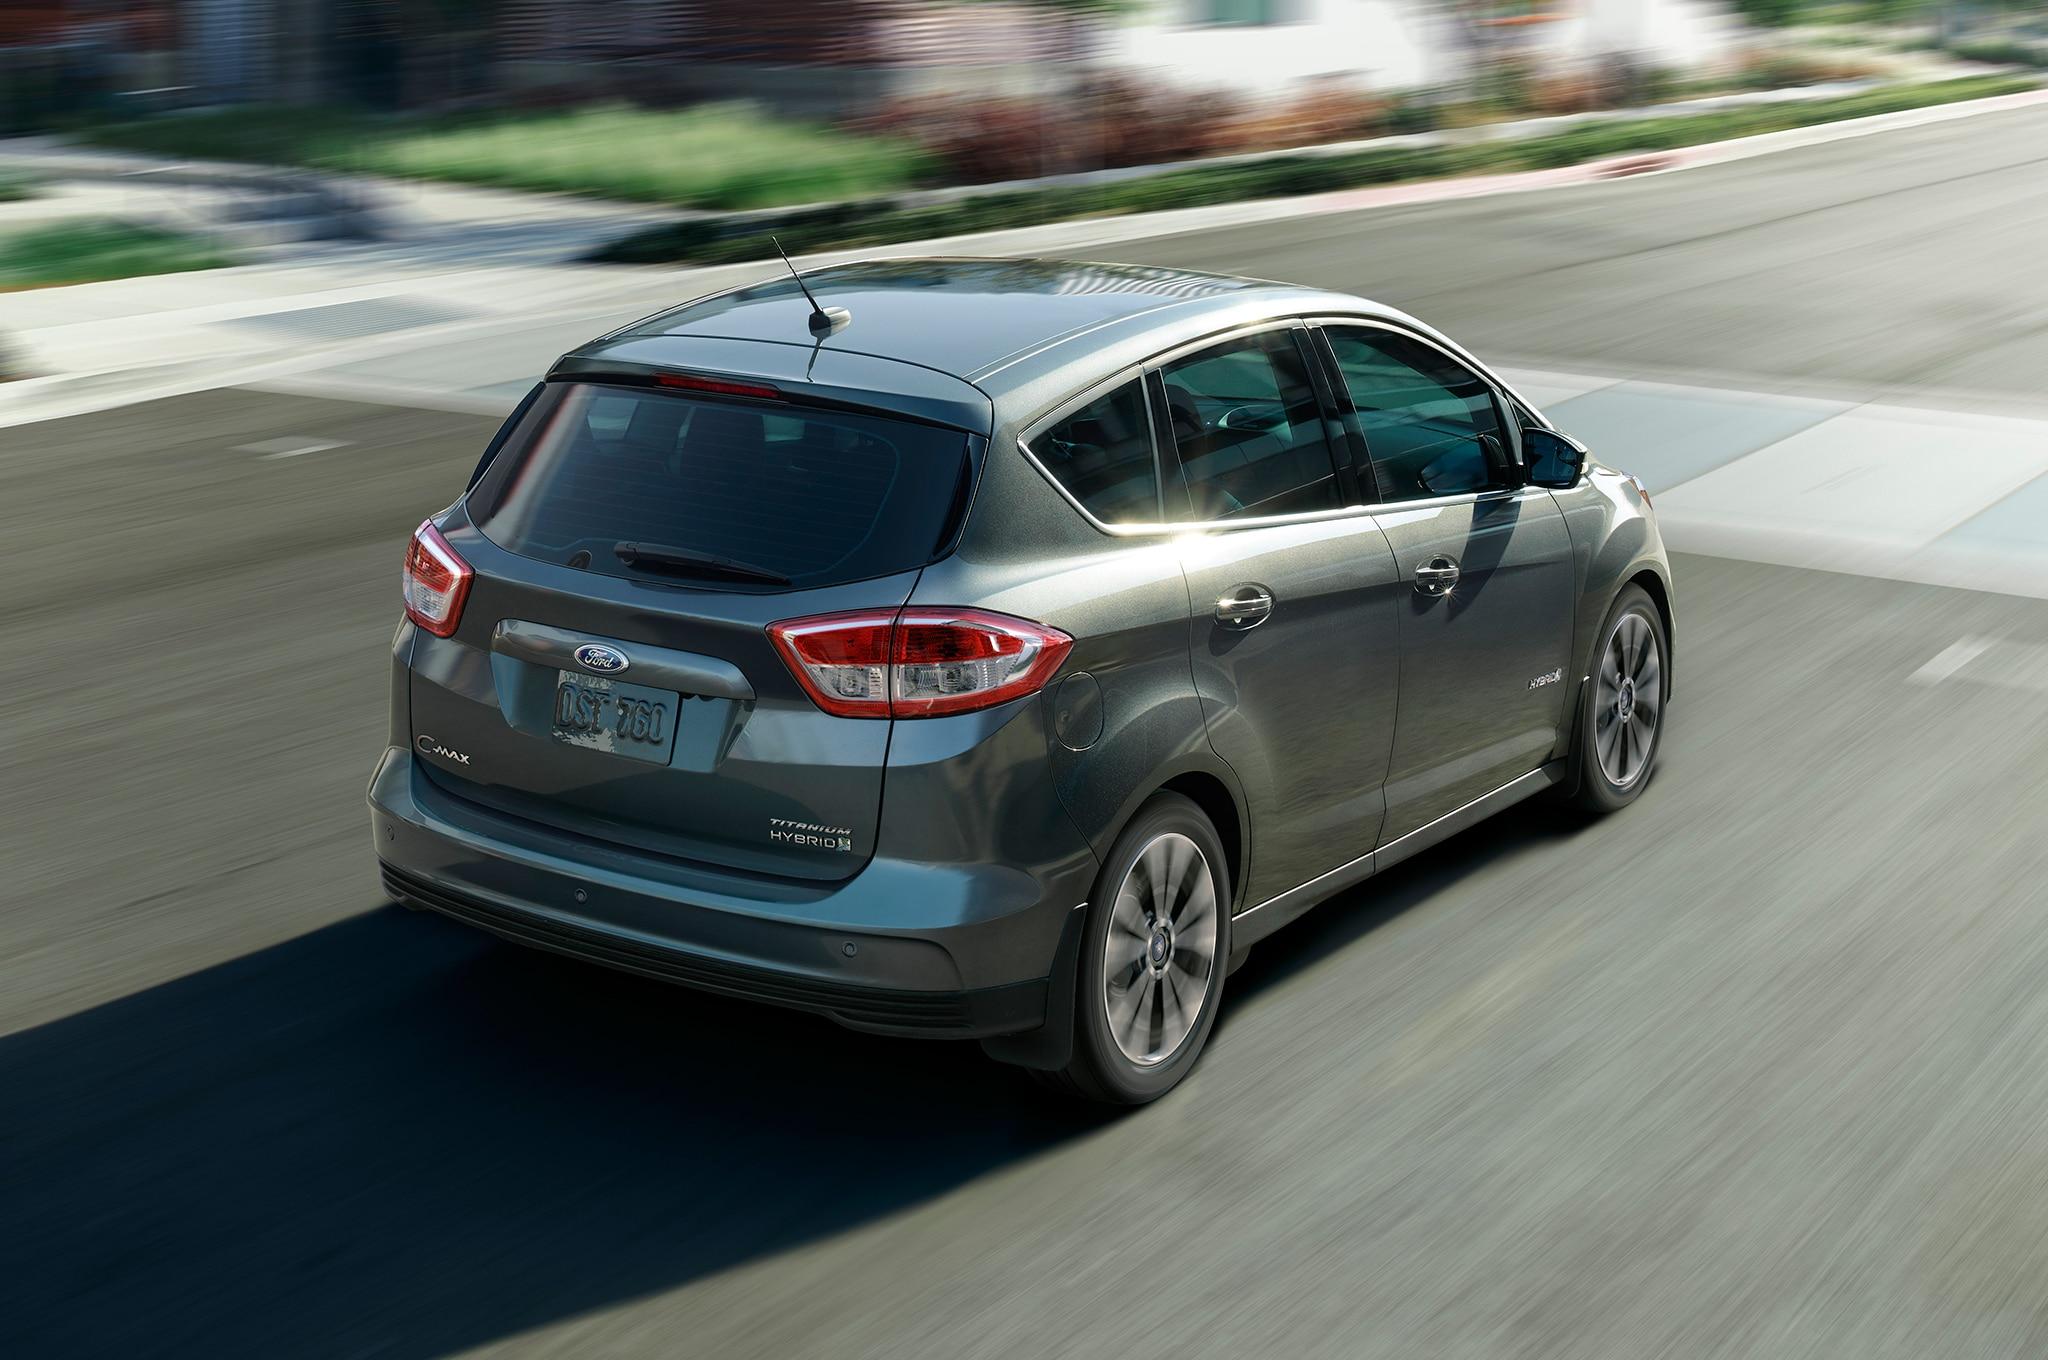 2017 ford c max receives new titanium trim lower starting price automobile magazine. Black Bedroom Furniture Sets. Home Design Ideas